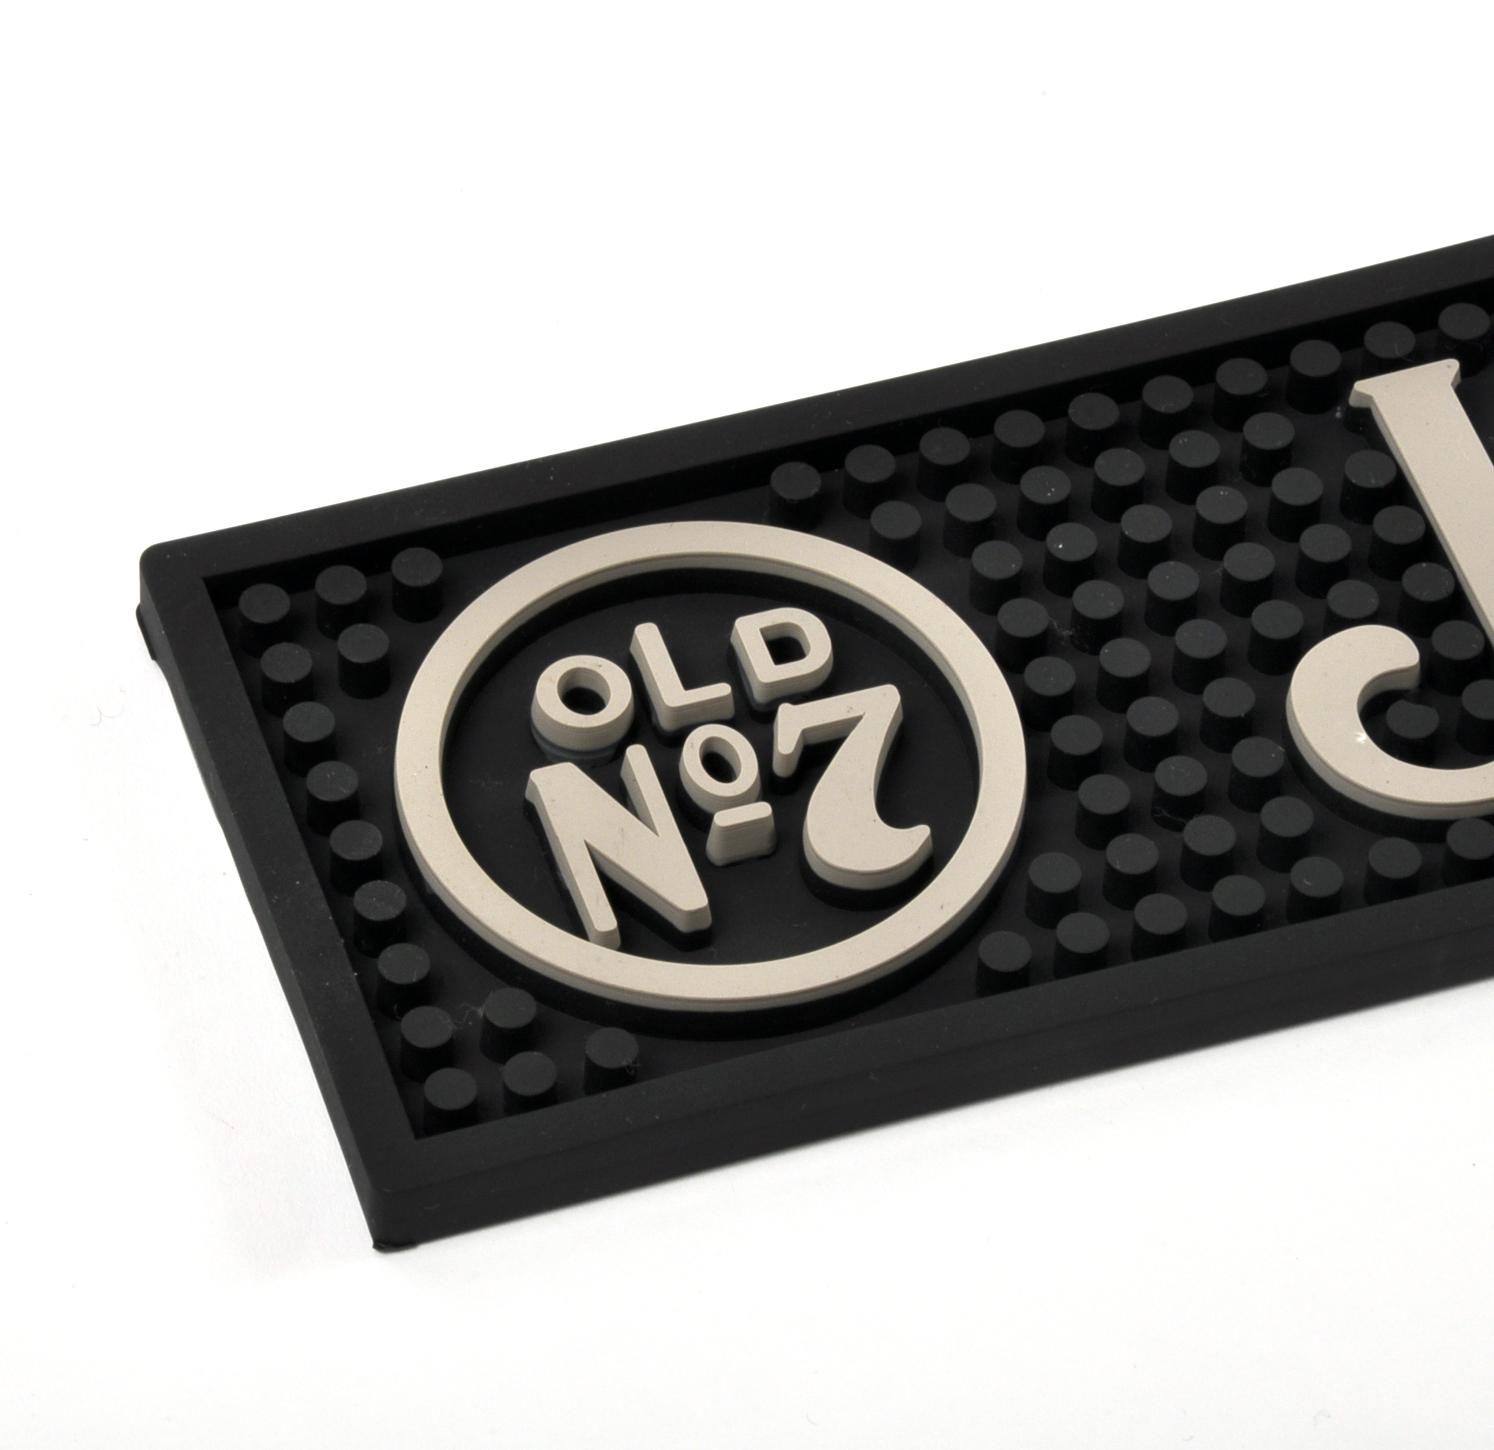 manufacturers showroom bar mat suppliers com jack and artois alibaba cheap stella mats at daniels